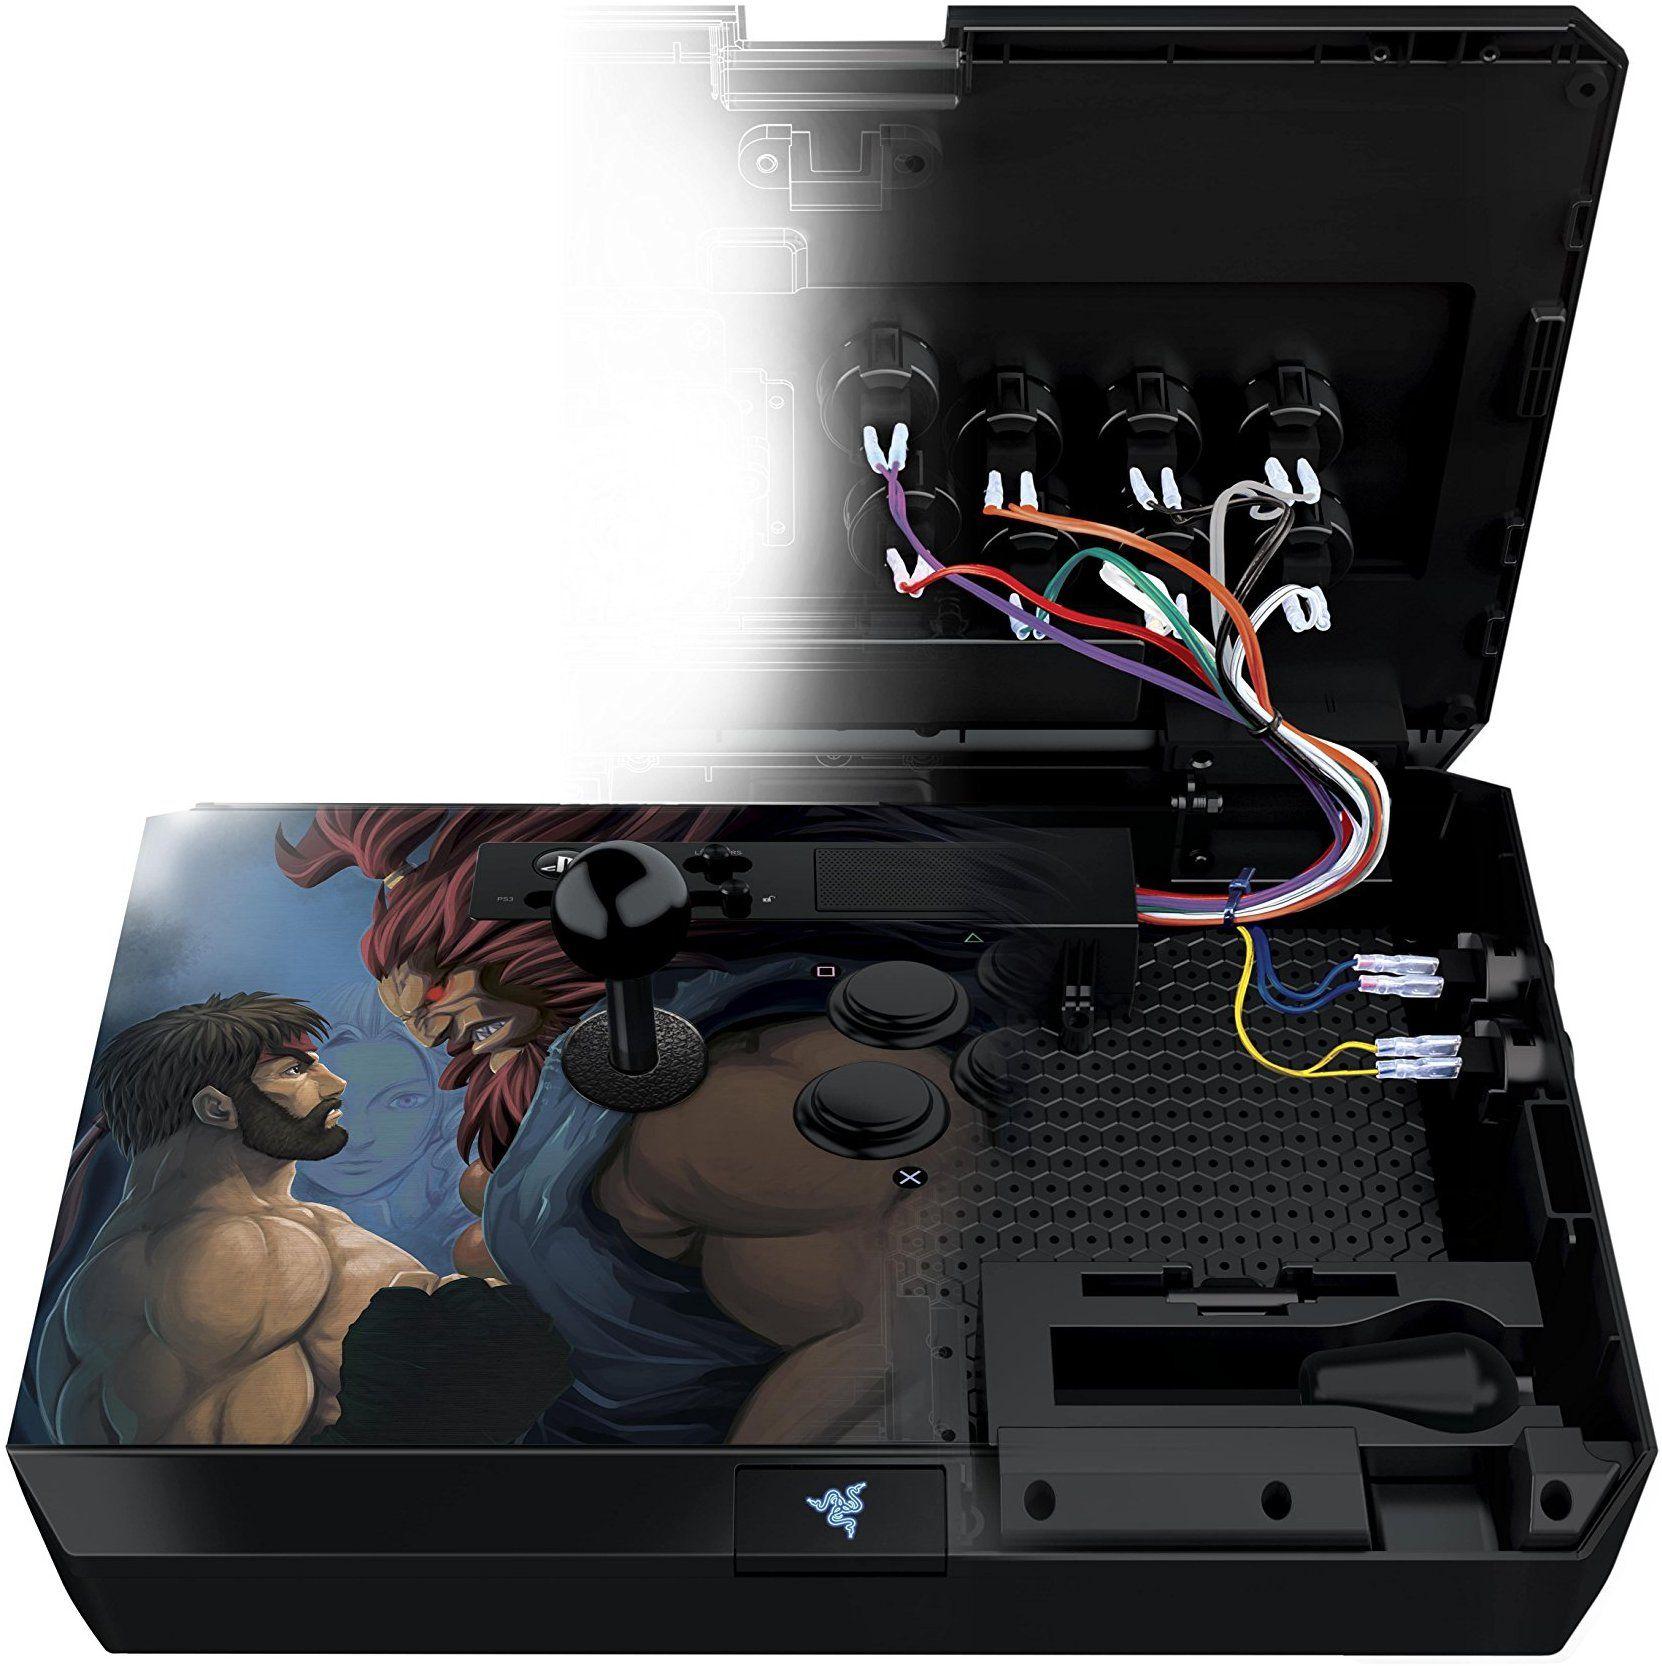 Контролер Razer Street Fighter V Panthera Arcade Stick for PS4® - 2